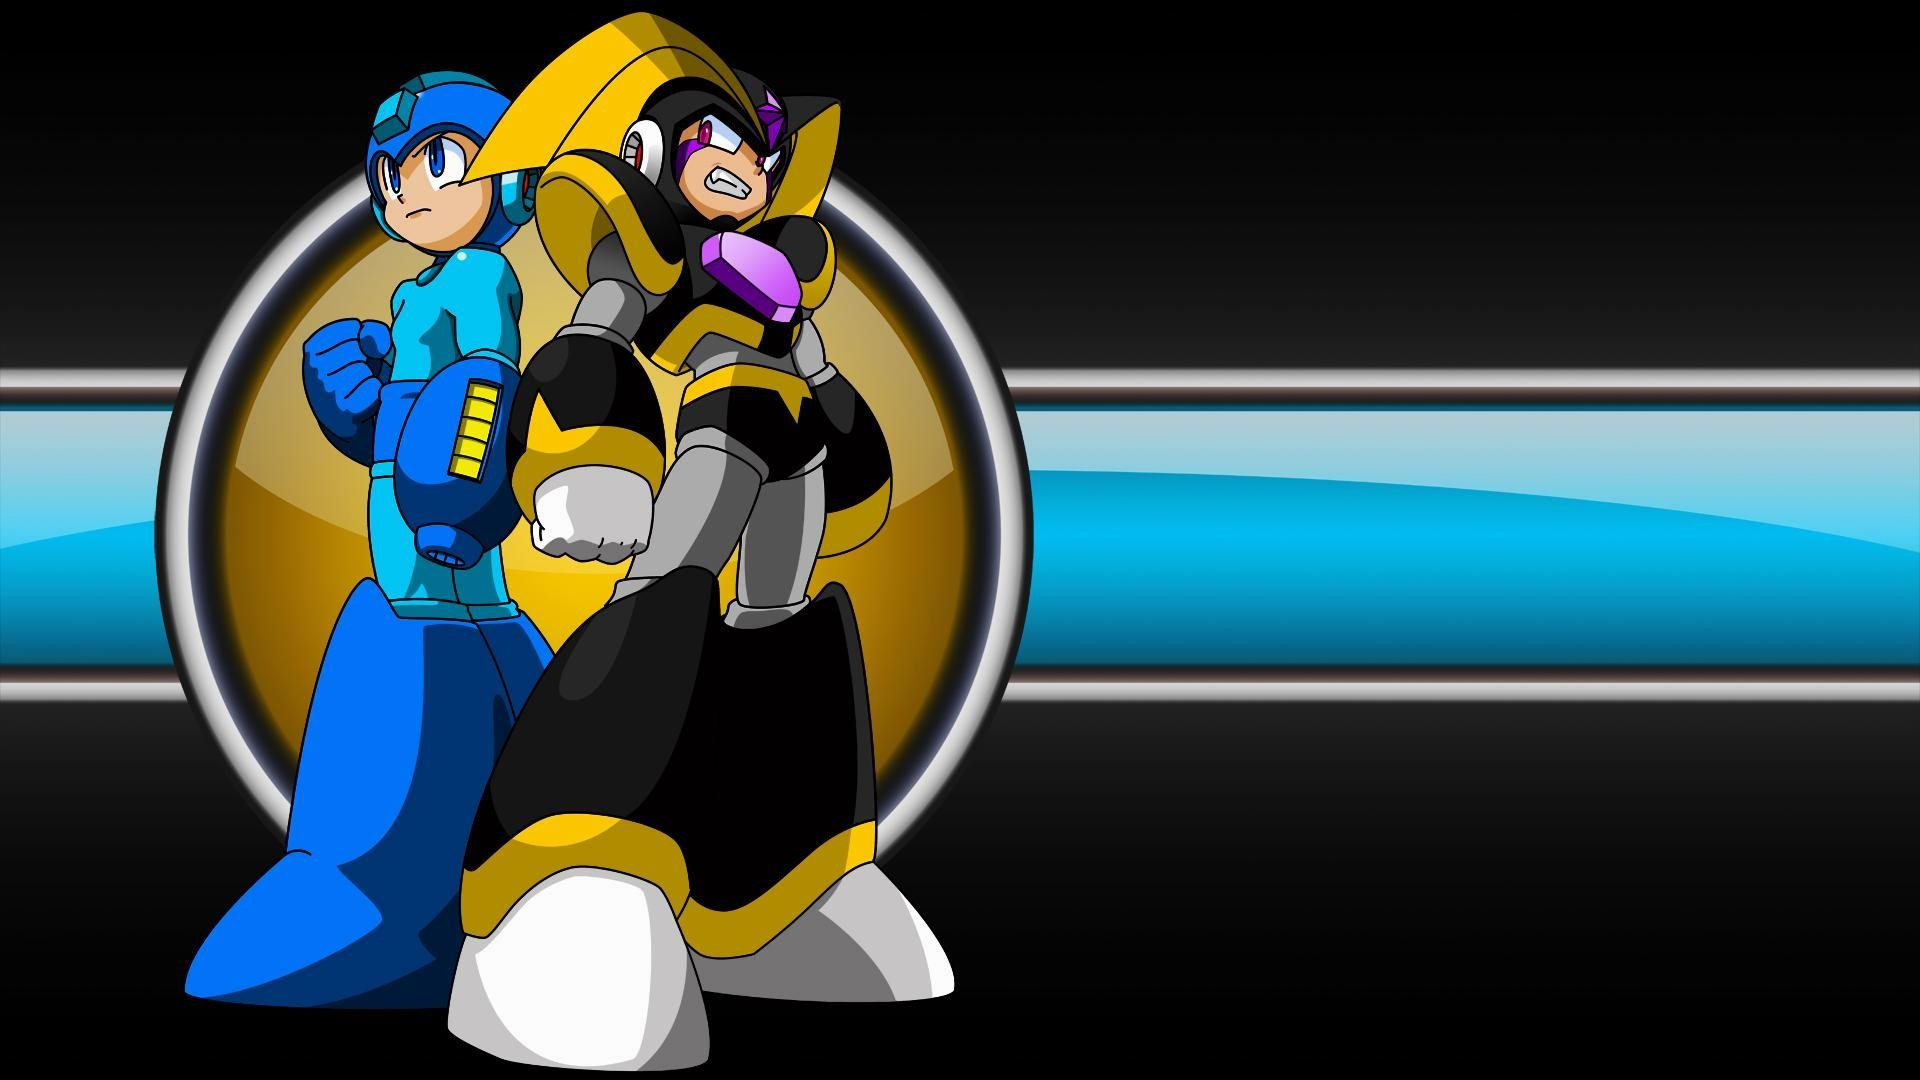 Megaman-Backgrounds-Images-Download